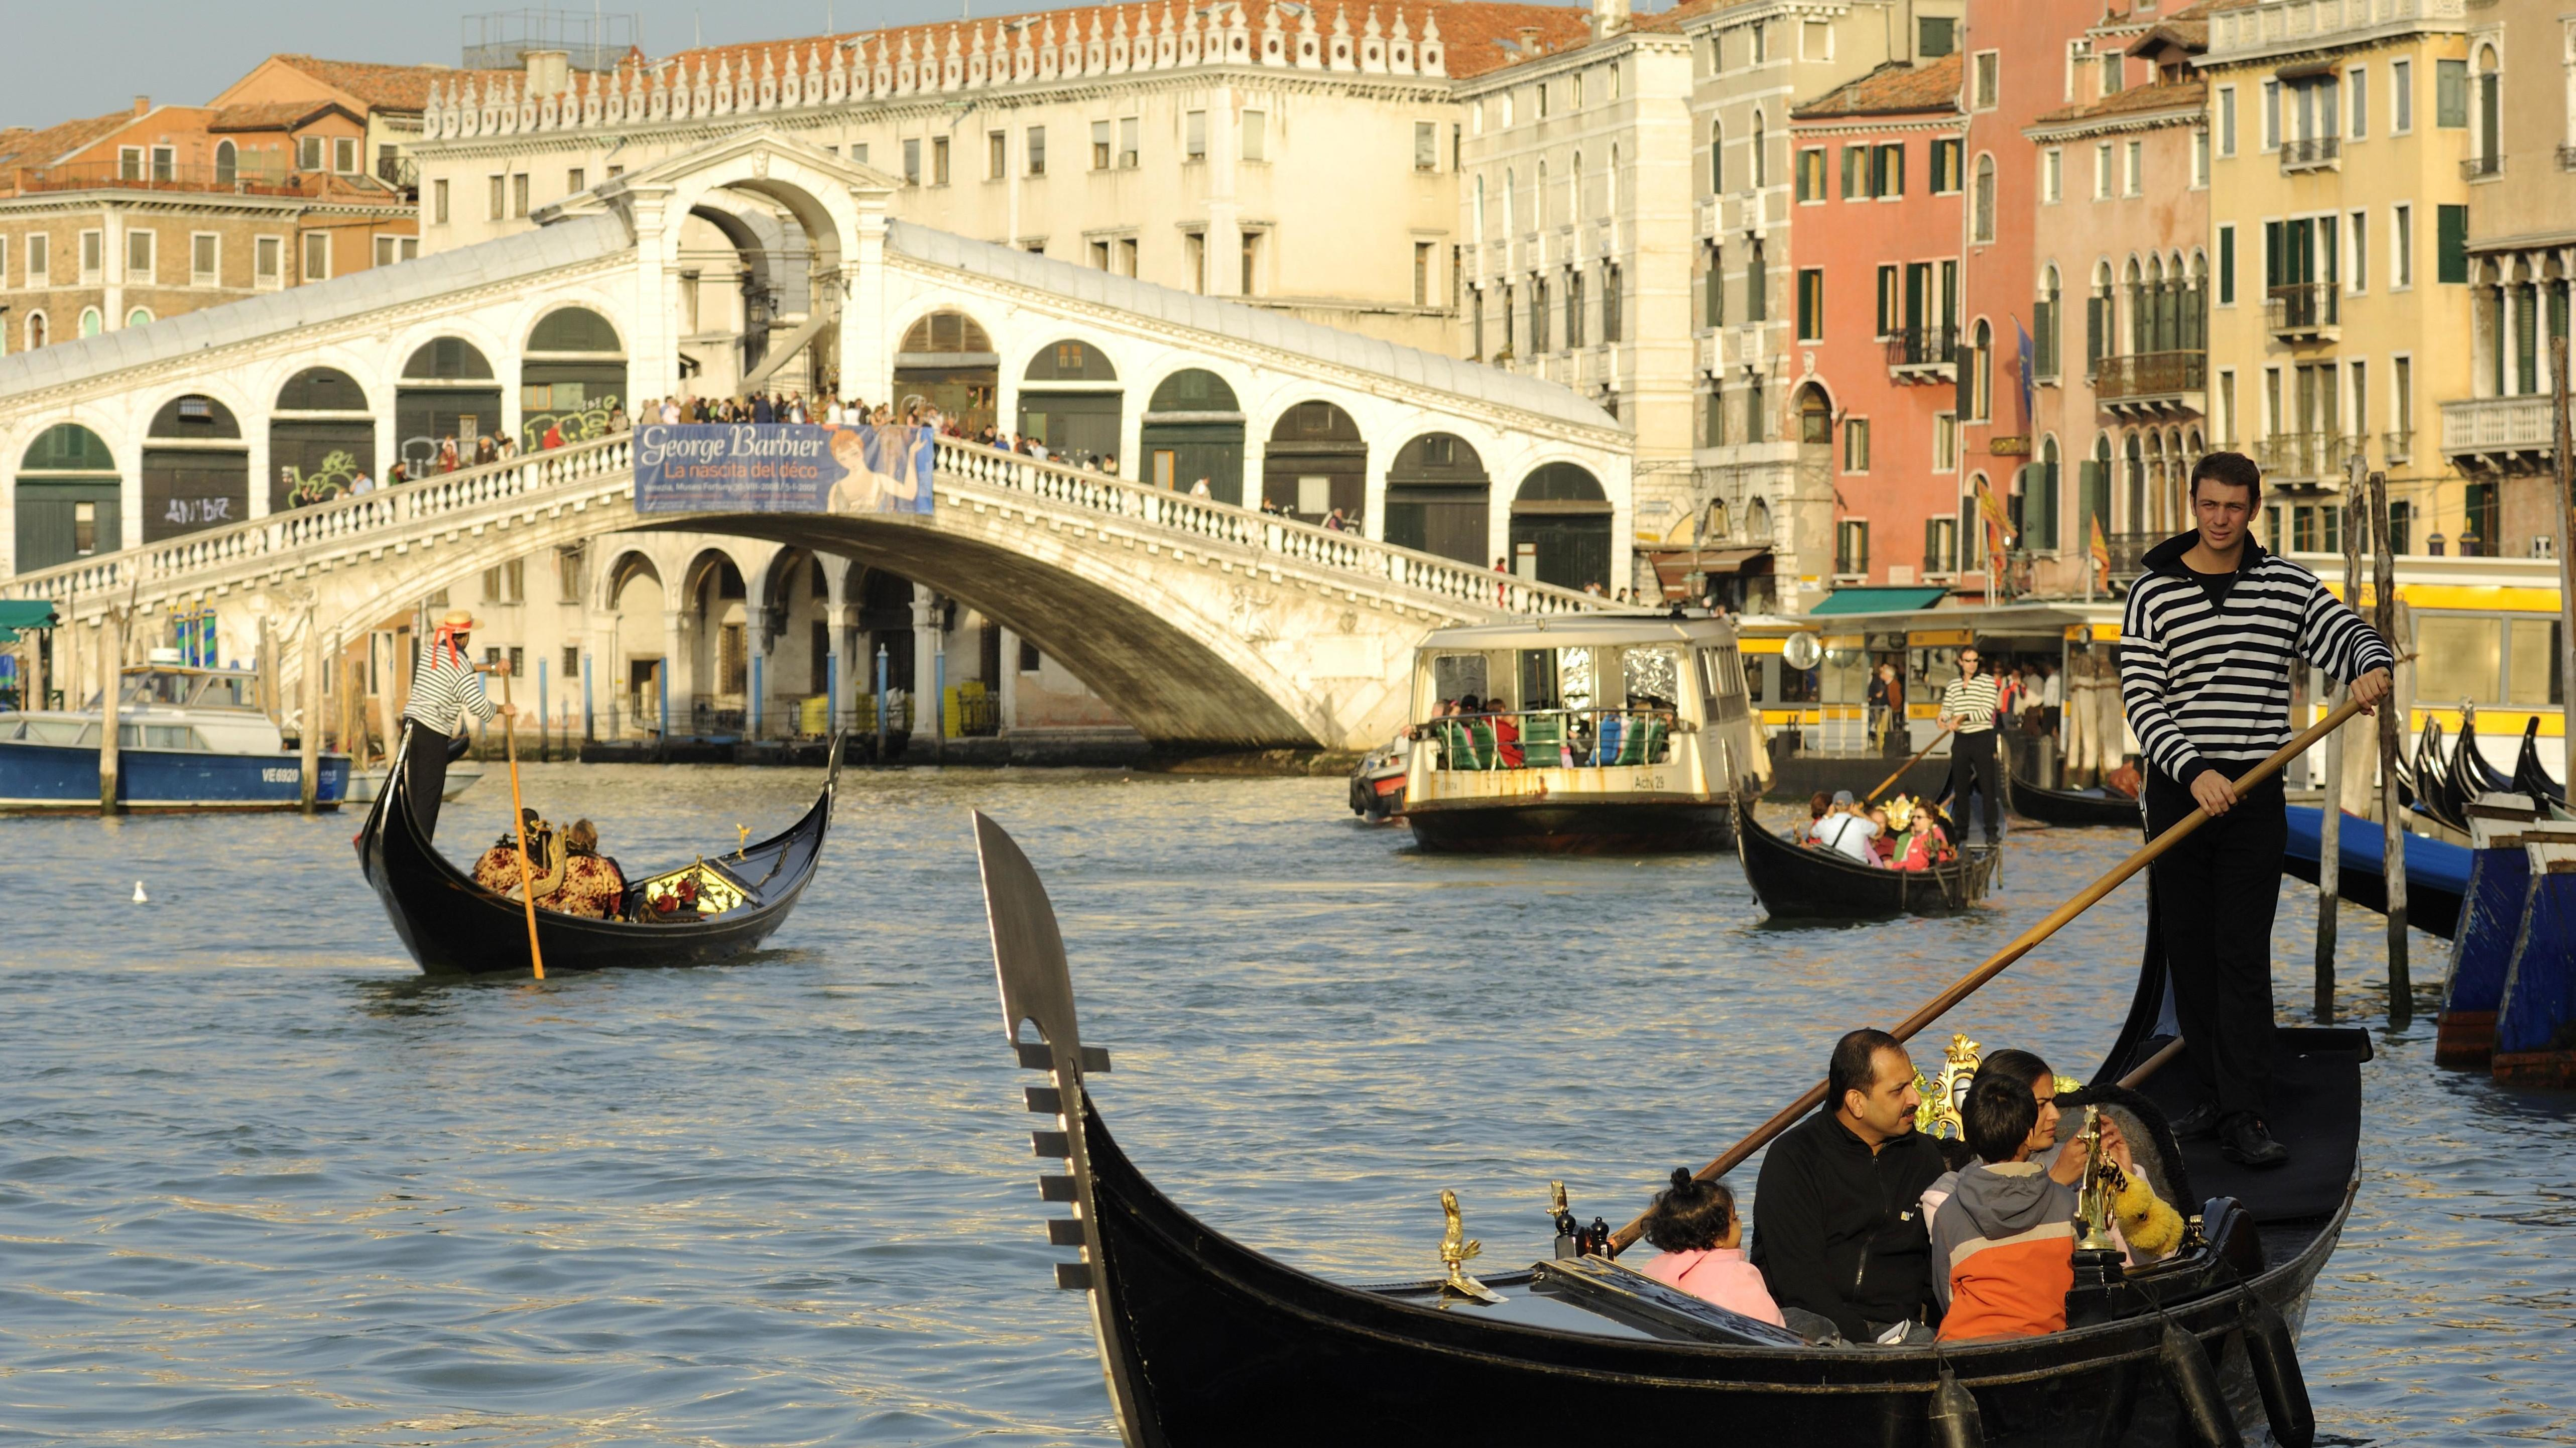 Gondoliere auf dem Canal Grande, Venedig, Italien, Europa